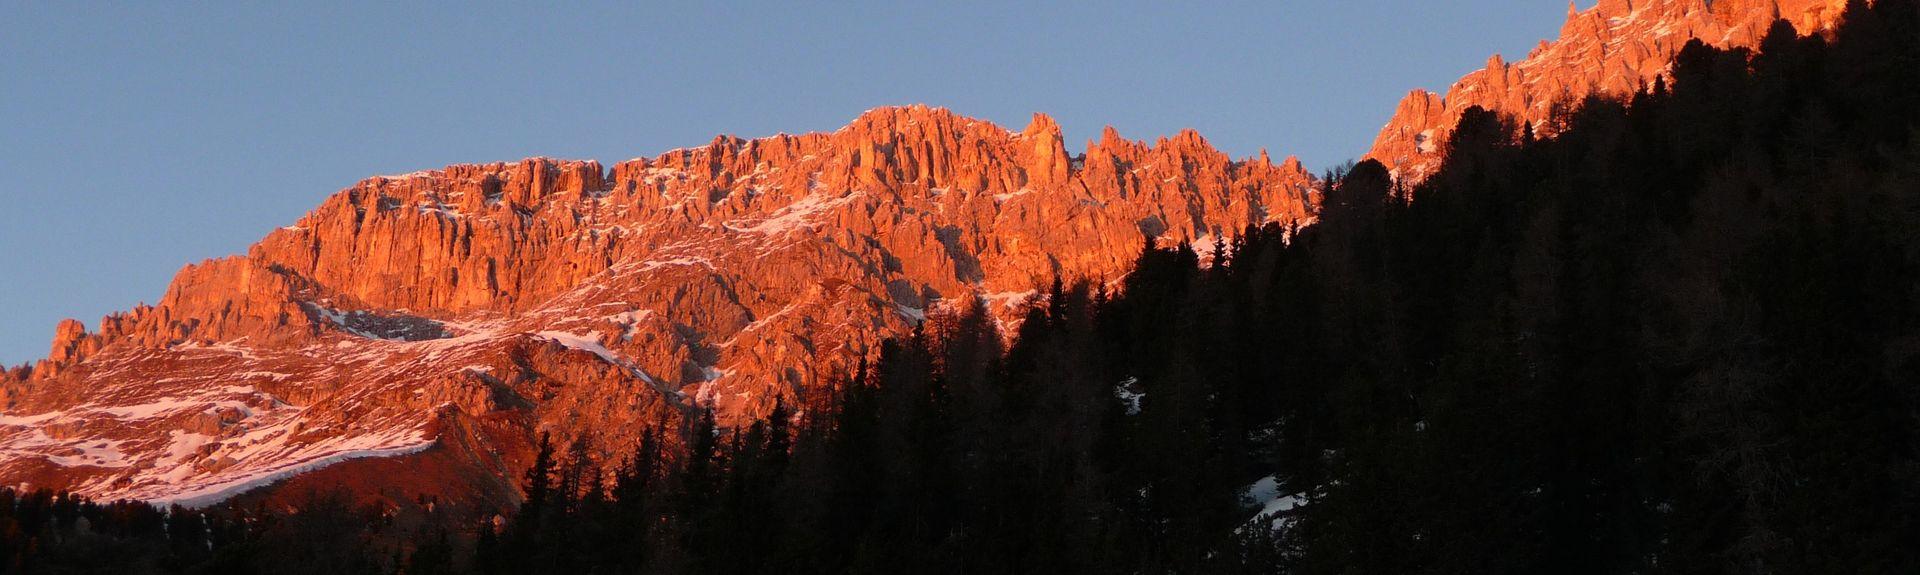 Case Vacanza Per Bolzano It Case Etc Homeaway